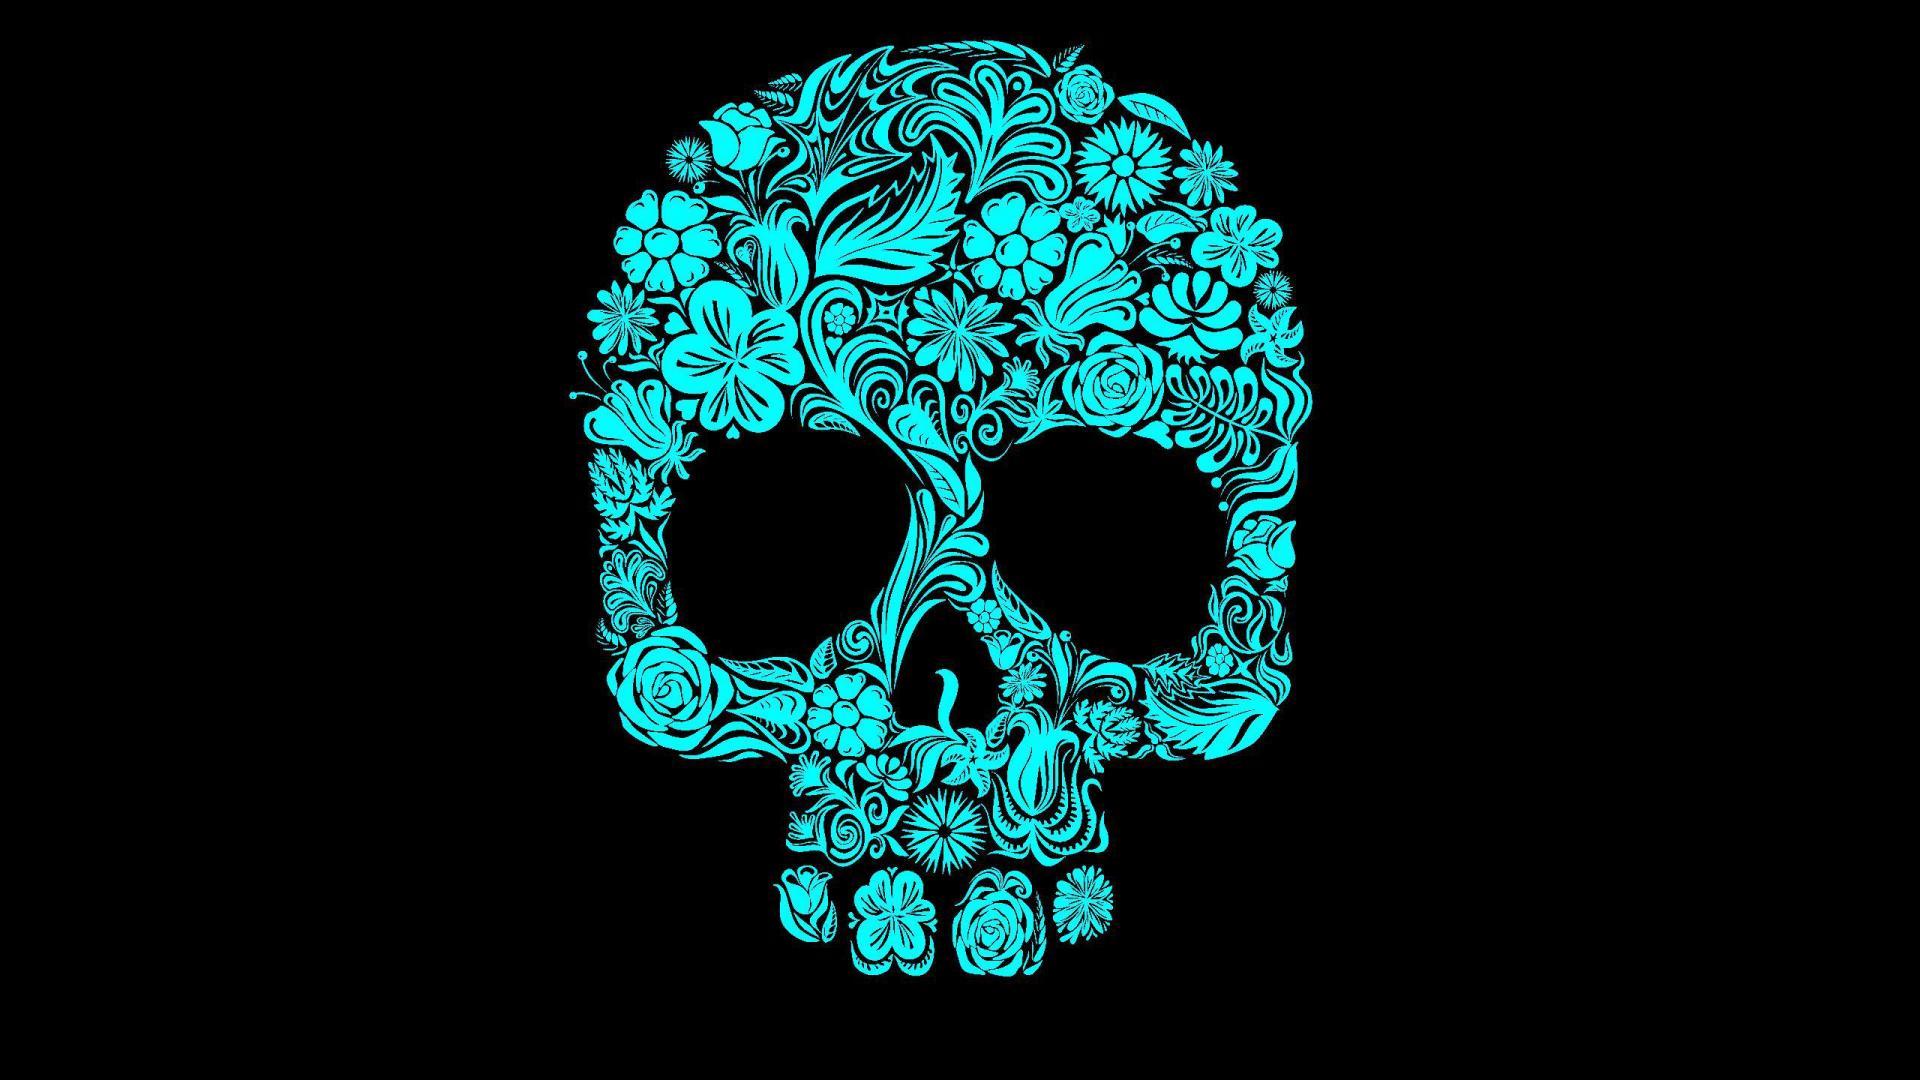 Flower Skull HD Wallpaper